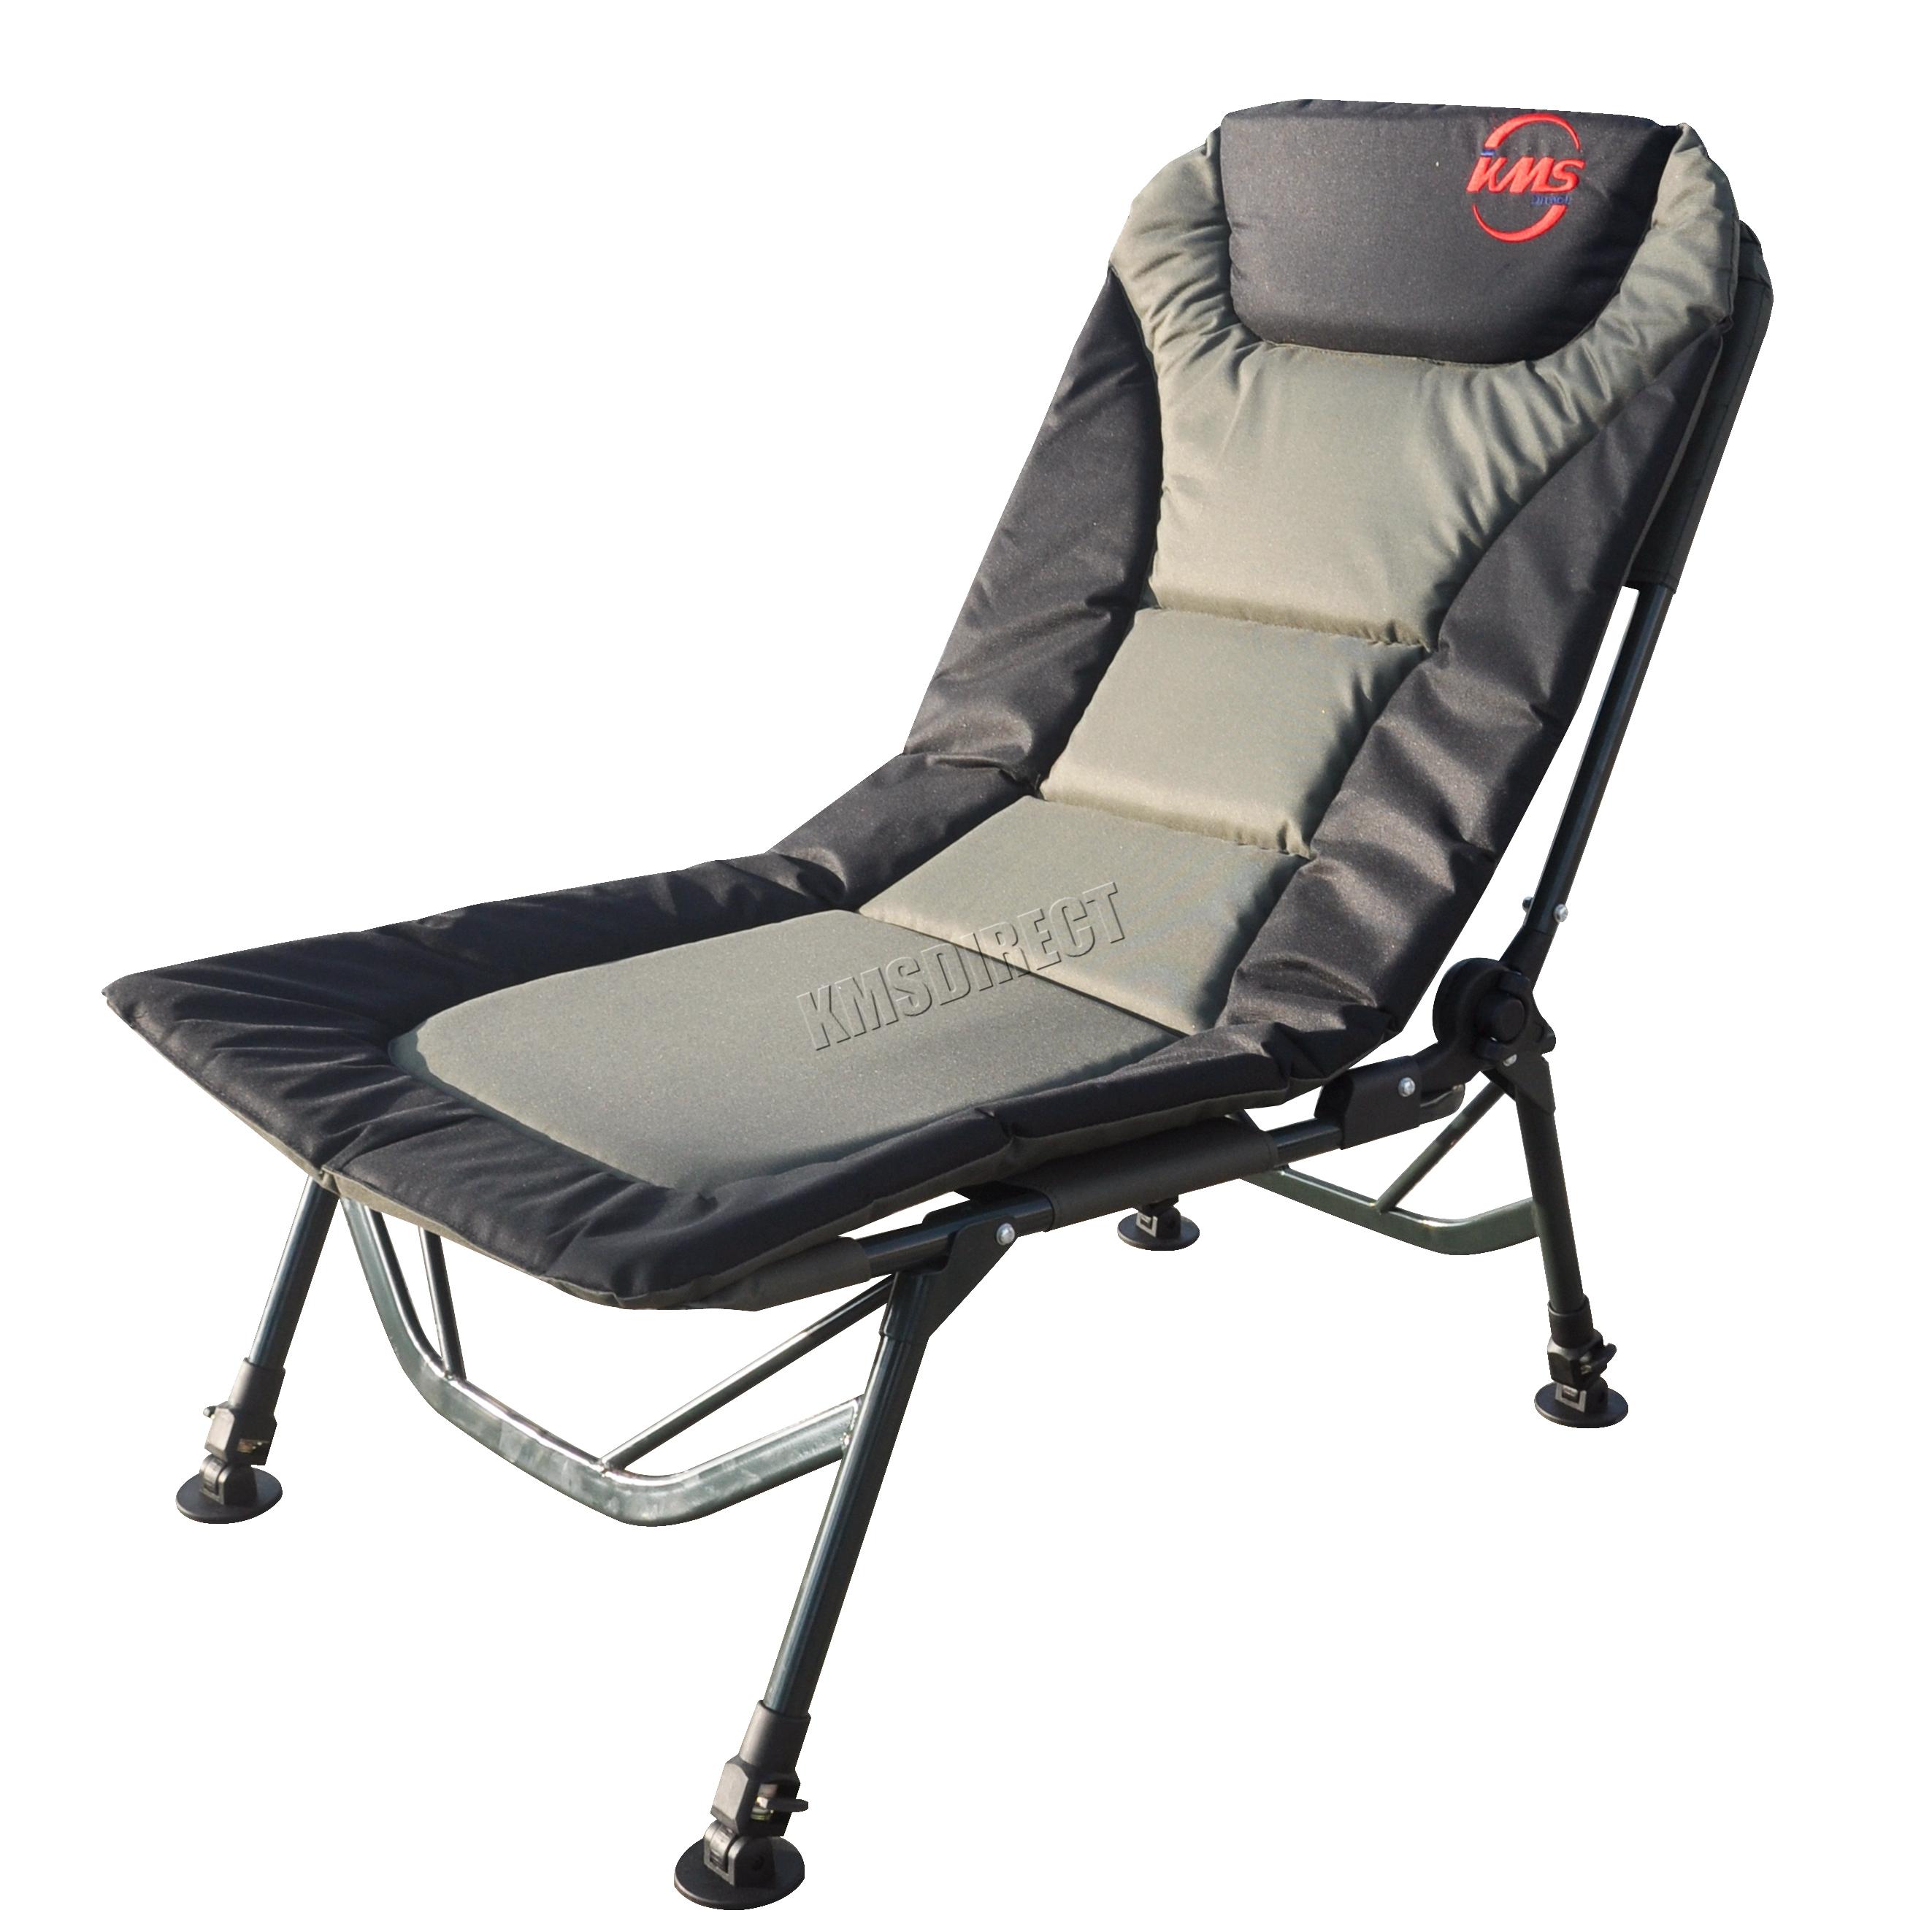 Ebay Folding Chairs